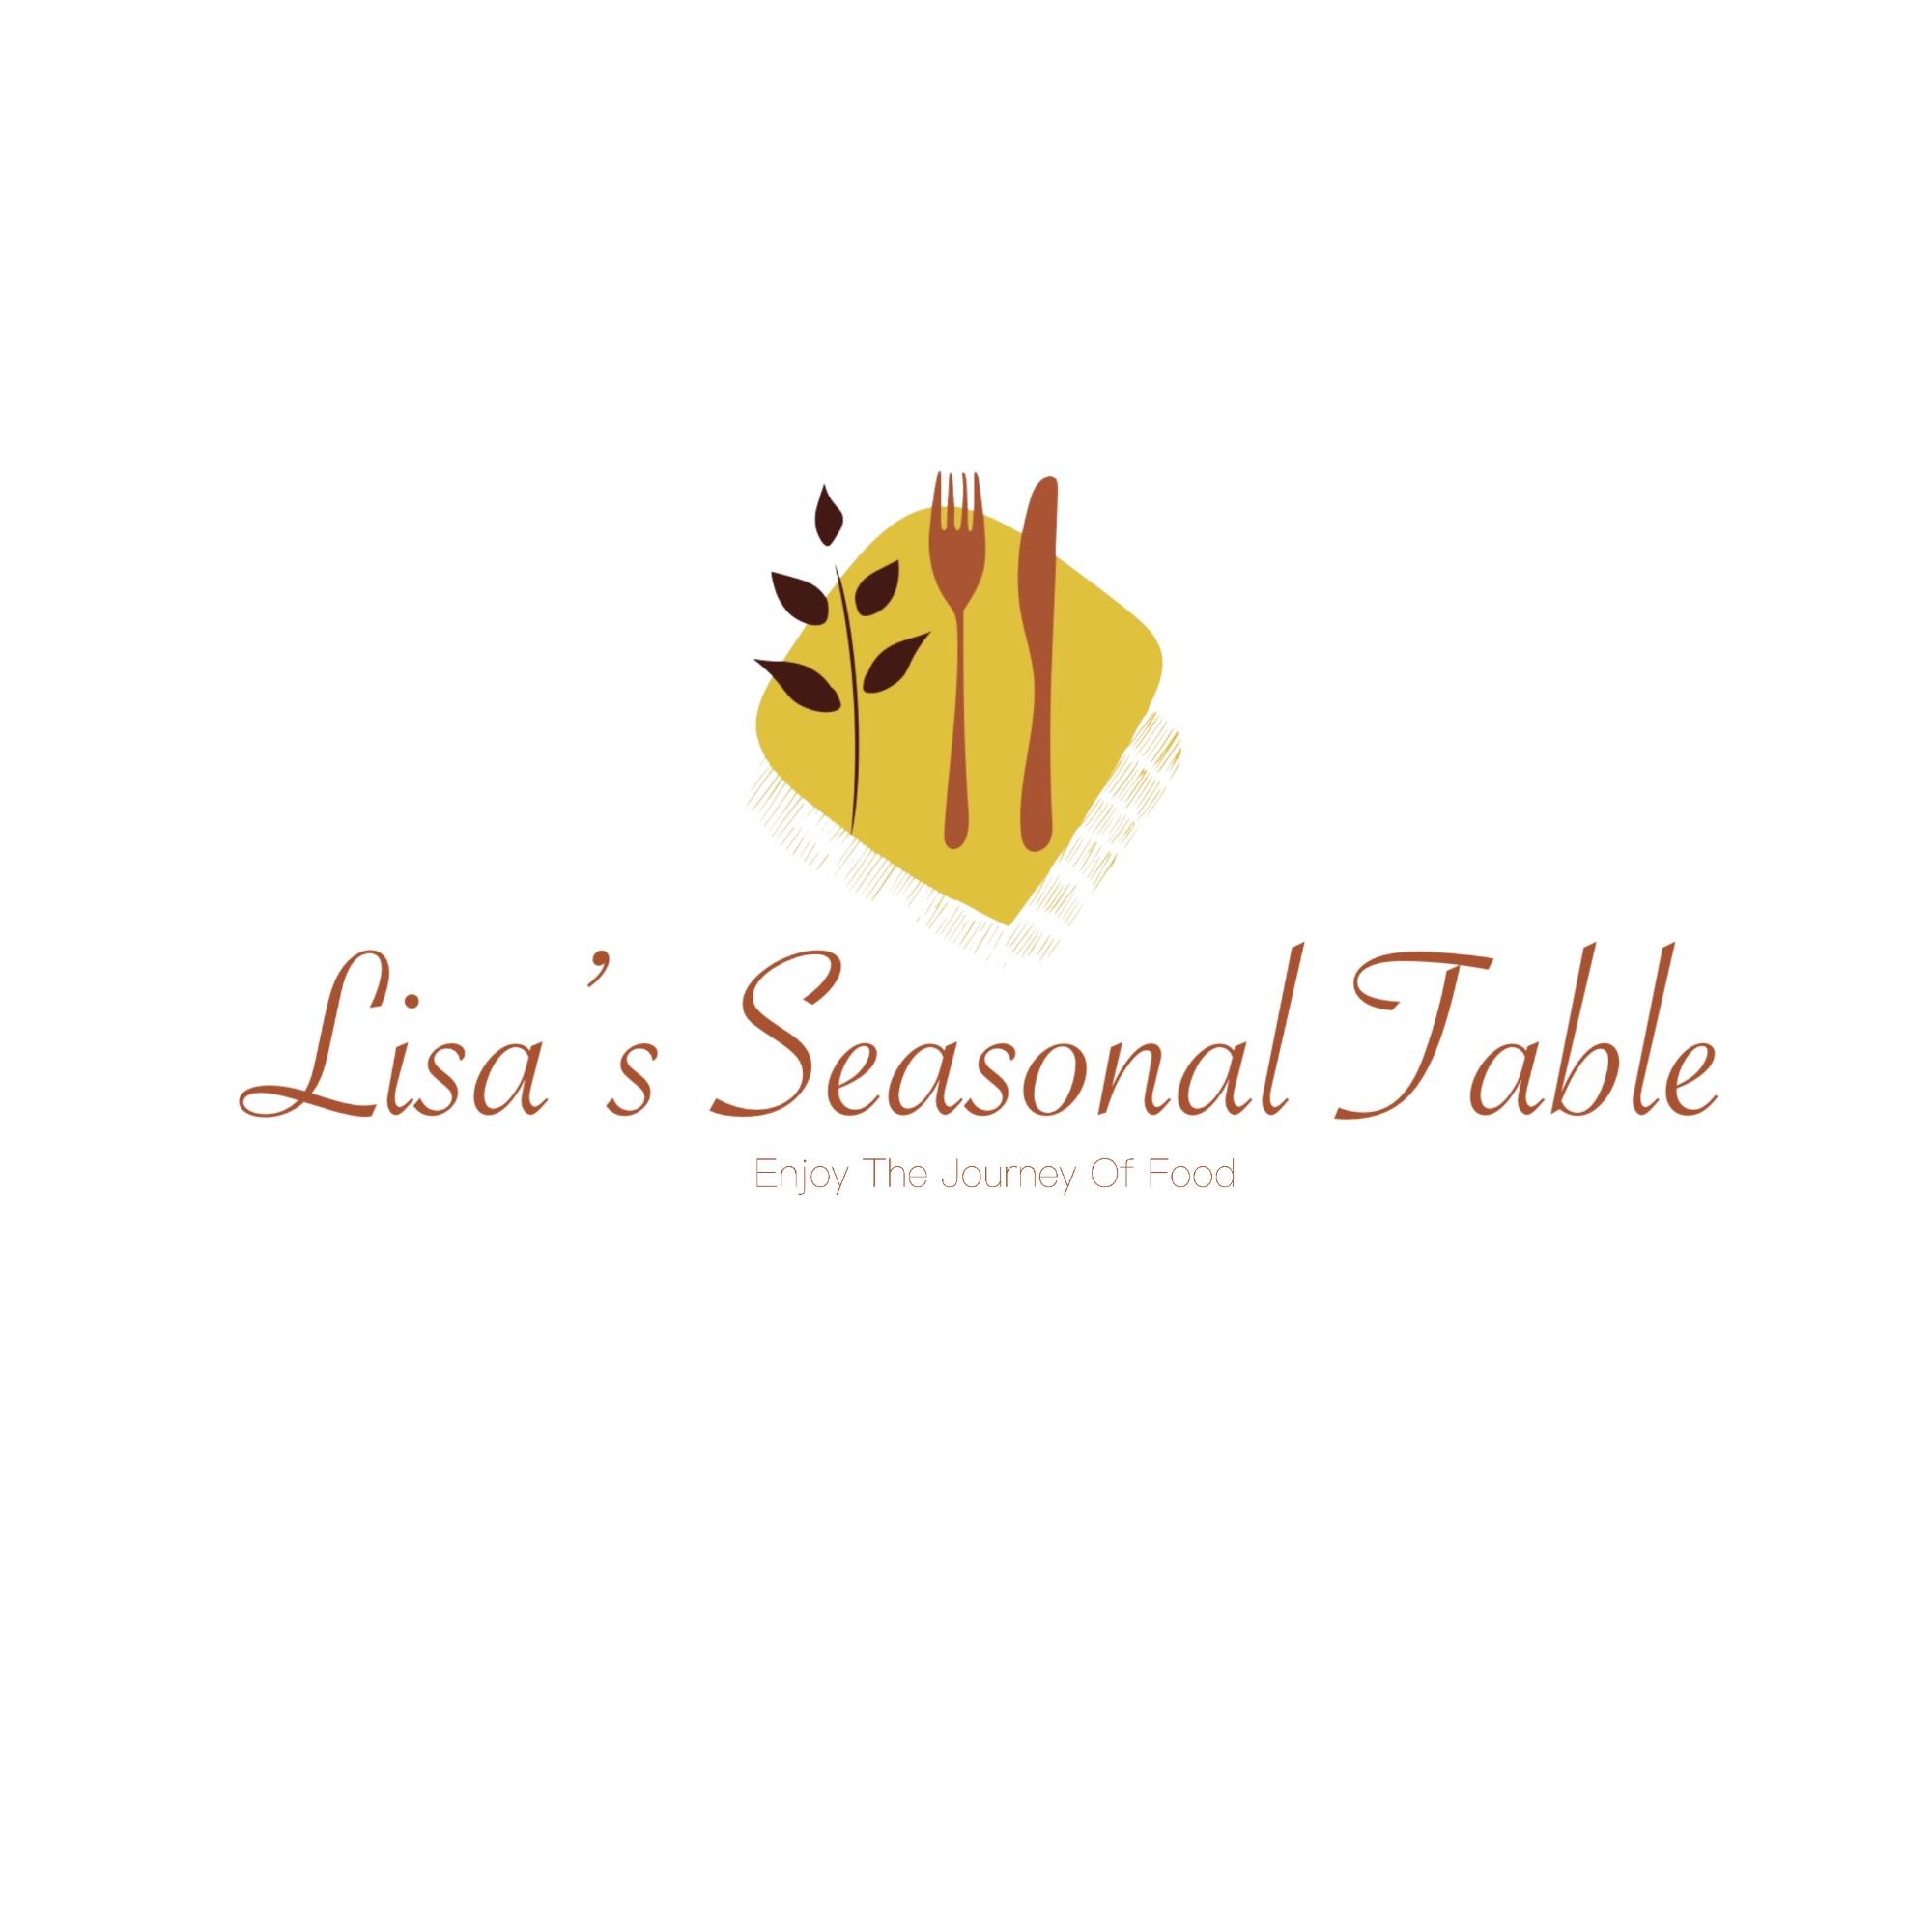 Image of Lisa's Seasonal Table